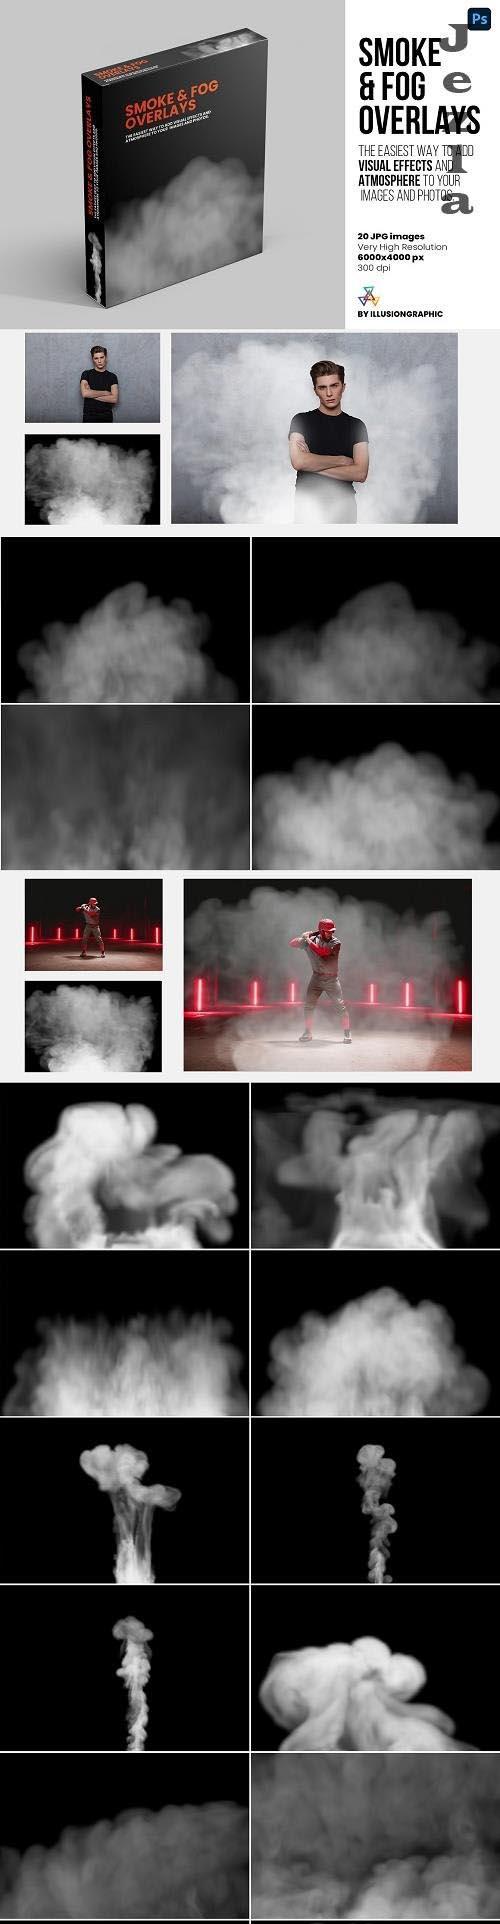 Smoke & Fog Overlays - 20 JPG - 6324671